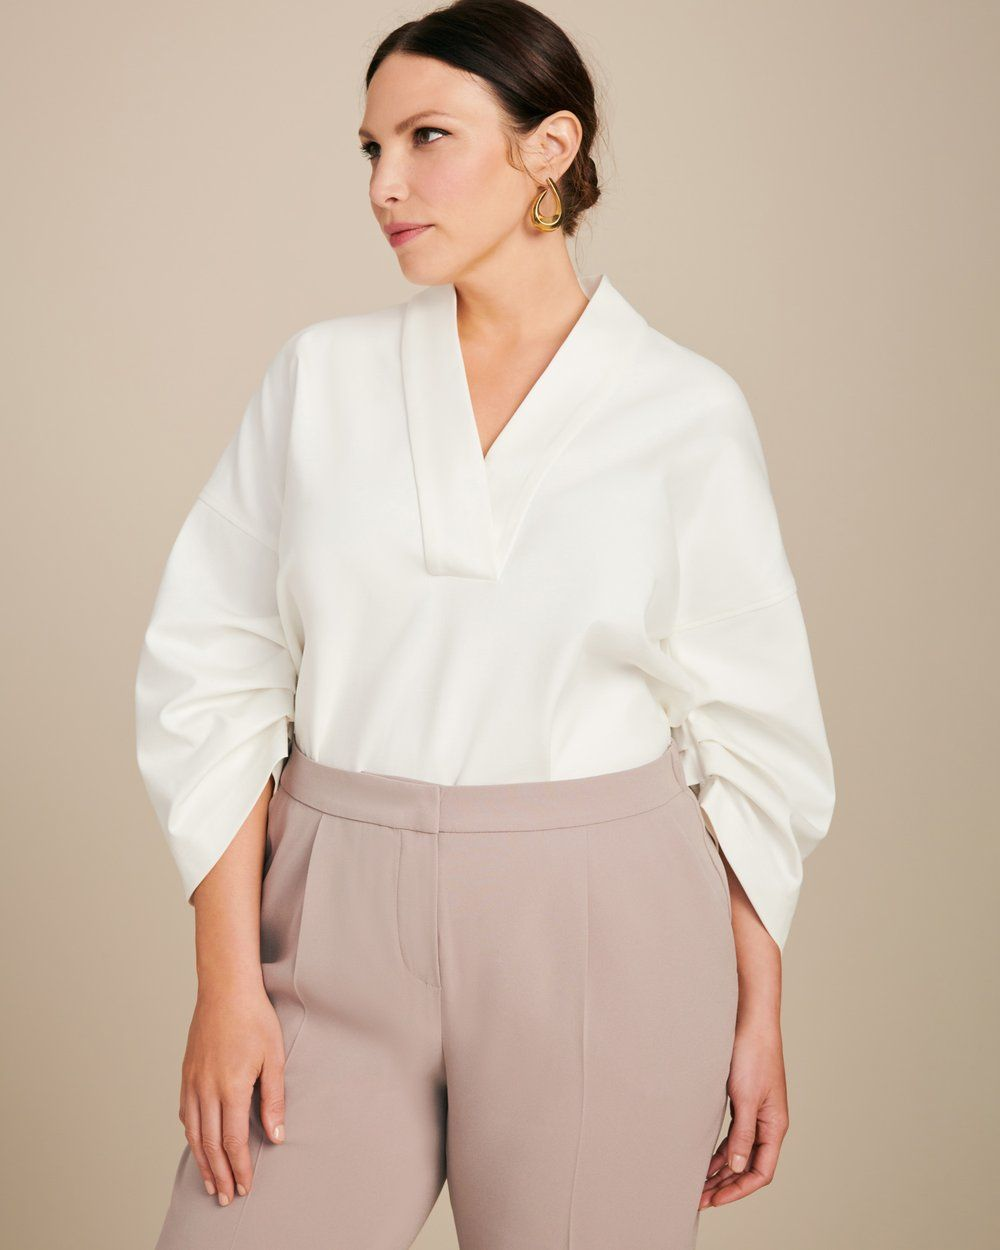 440ace4ae63 WORA Blouse in 2019 | My Style | Feminine dress, Fashion, Cream blouse